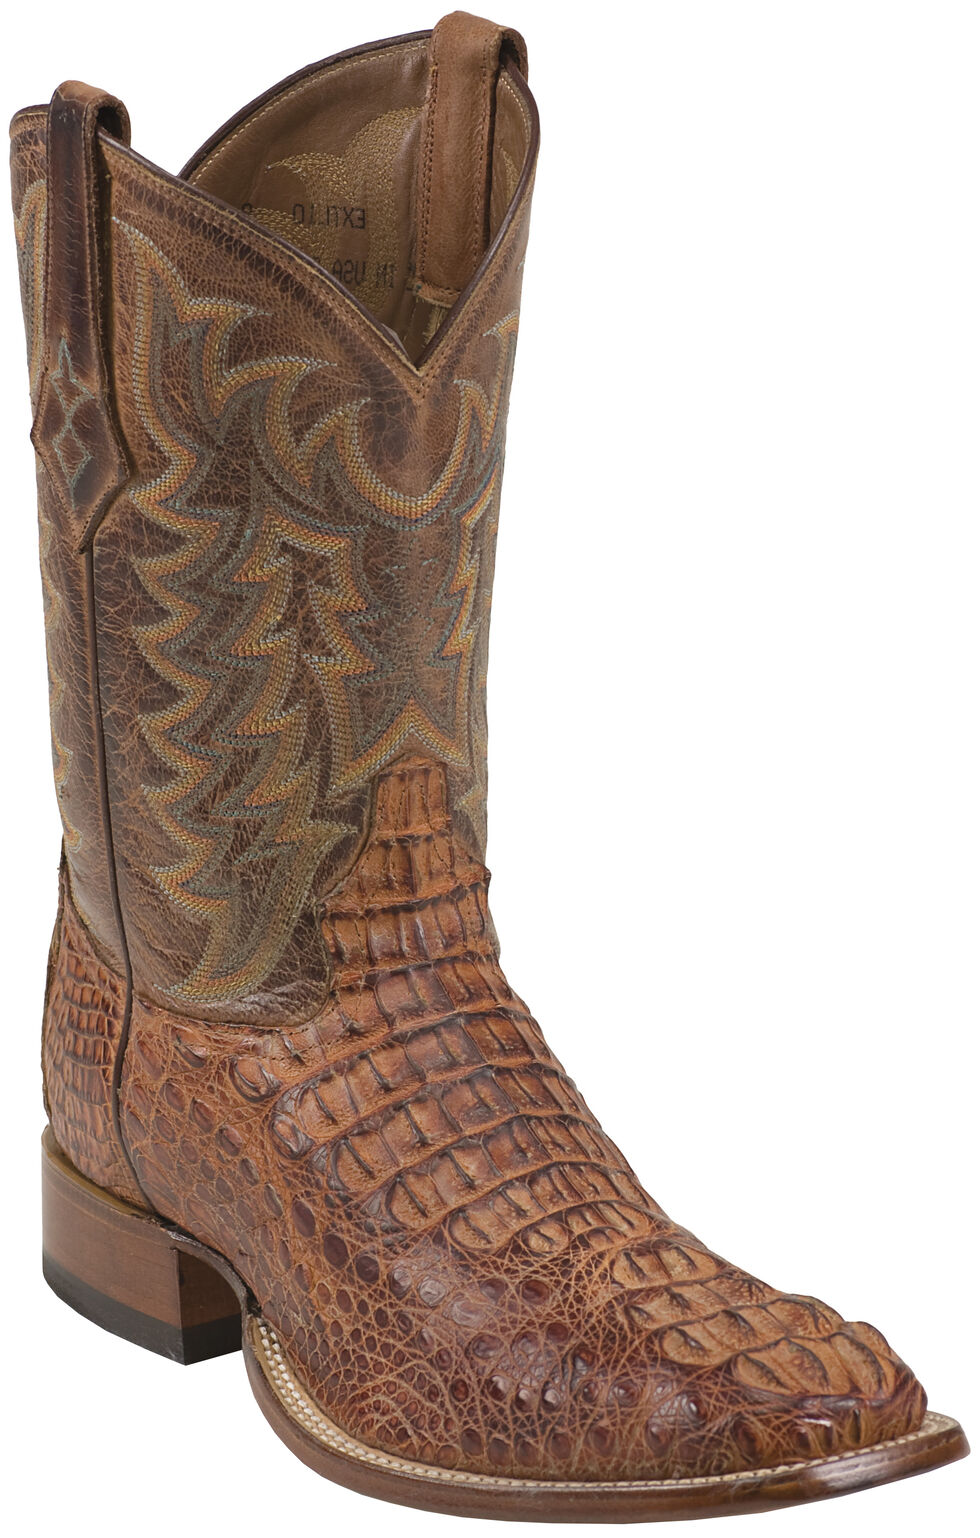 Tony Lama Chocolate Vintage Hornback Caiman Cowboy Boots - Square Toe , , hi-res